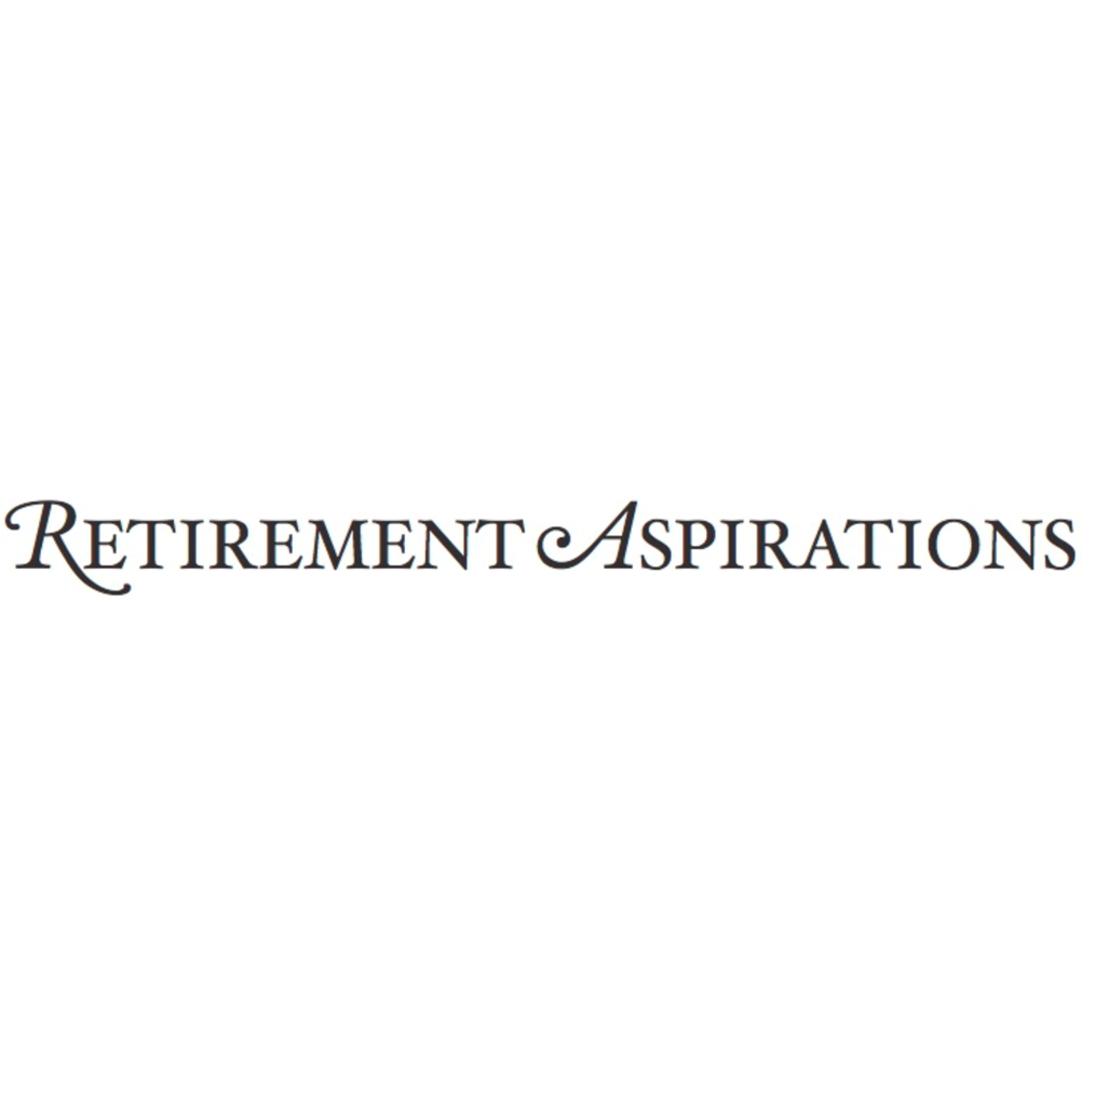 Retirement Aspirations